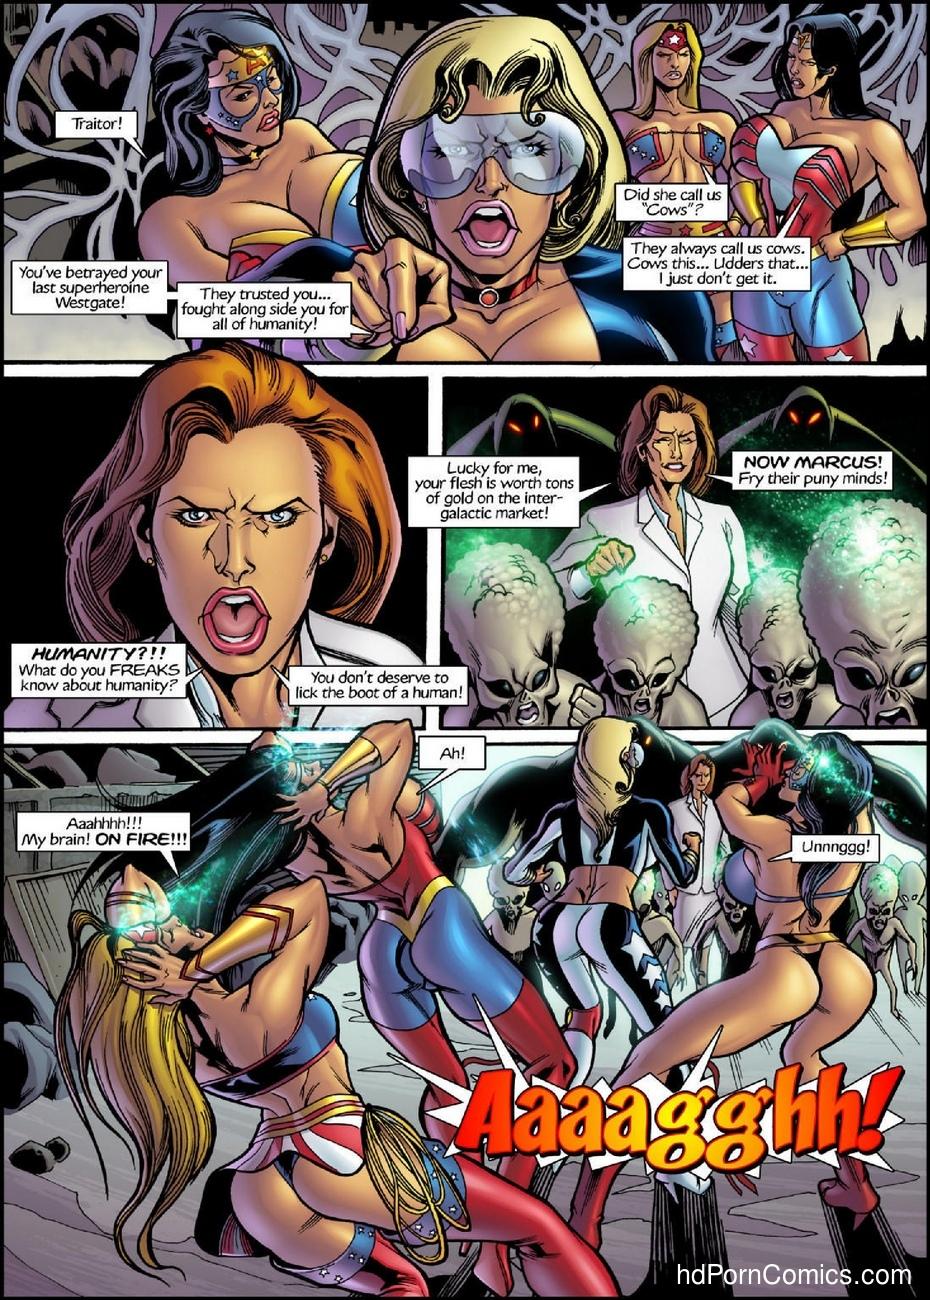 Freedom Stars - Cattle Call 1 6 free sex comic